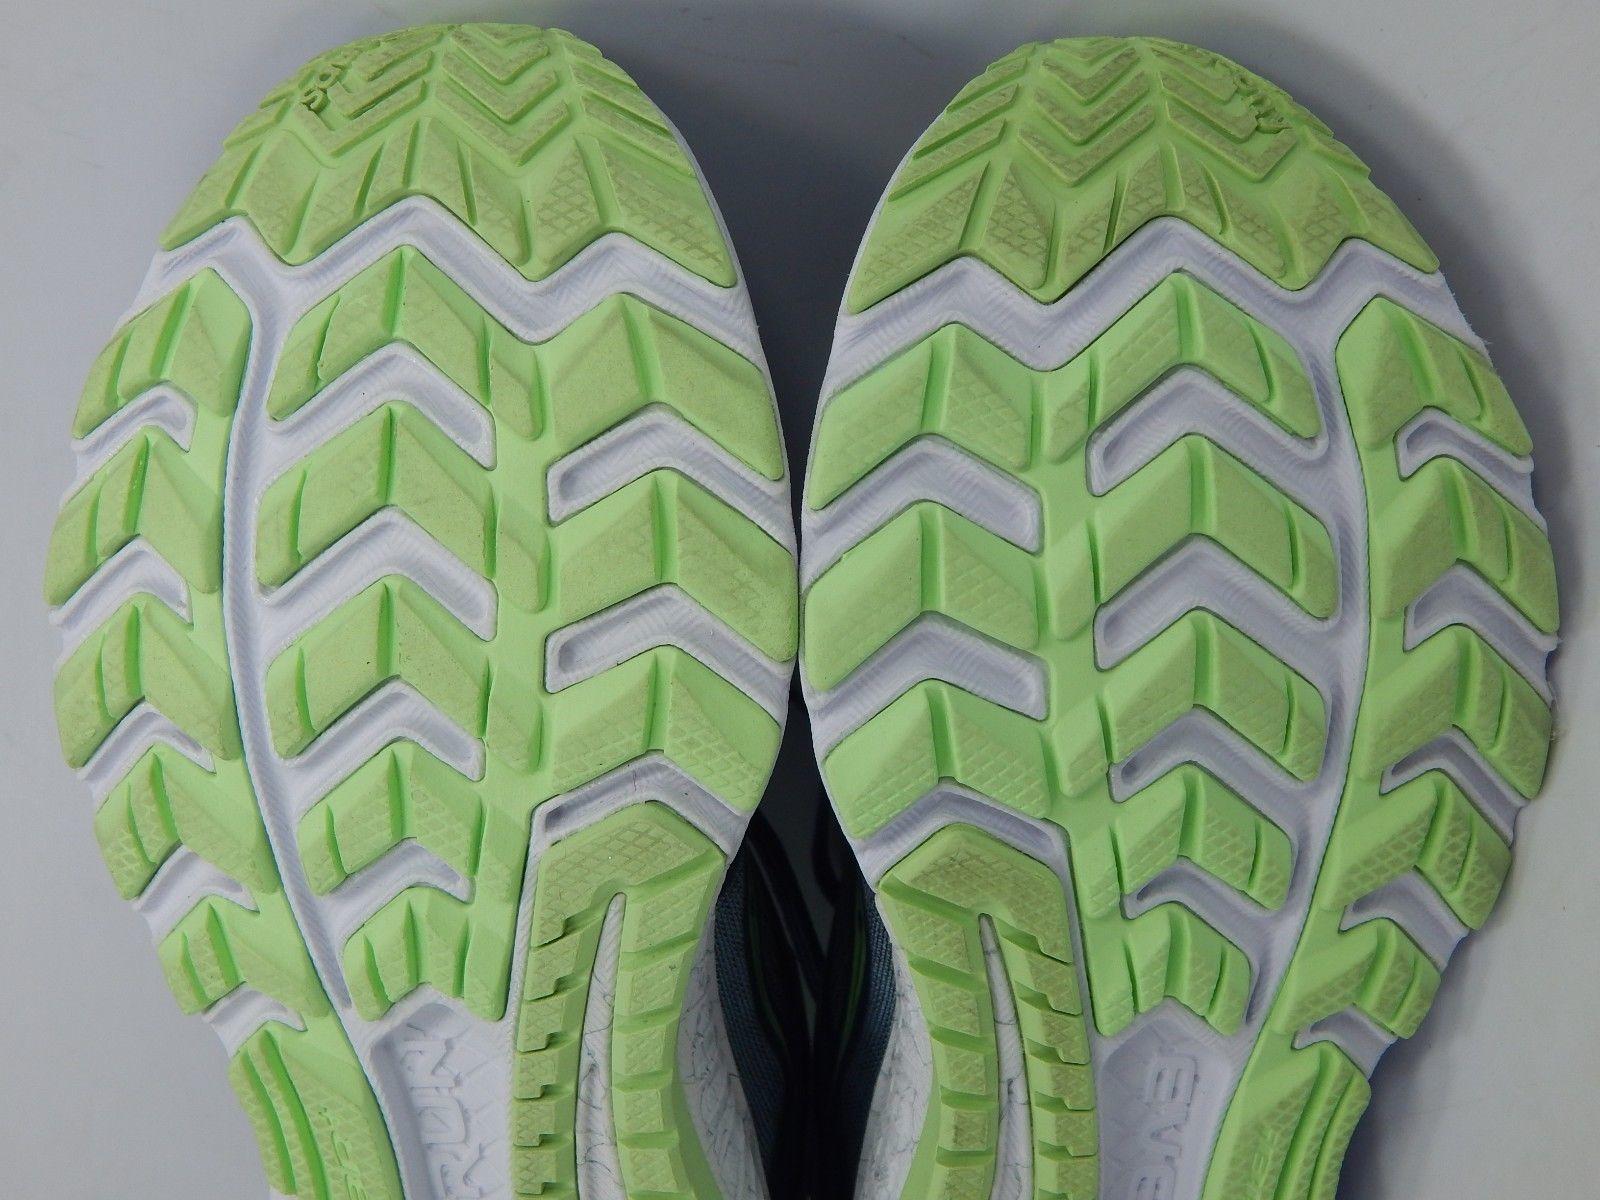 Saucony Guide ISO Size: 7.5 M (B) EU: 38.5 Women's Running Shoes Purple S10415-1